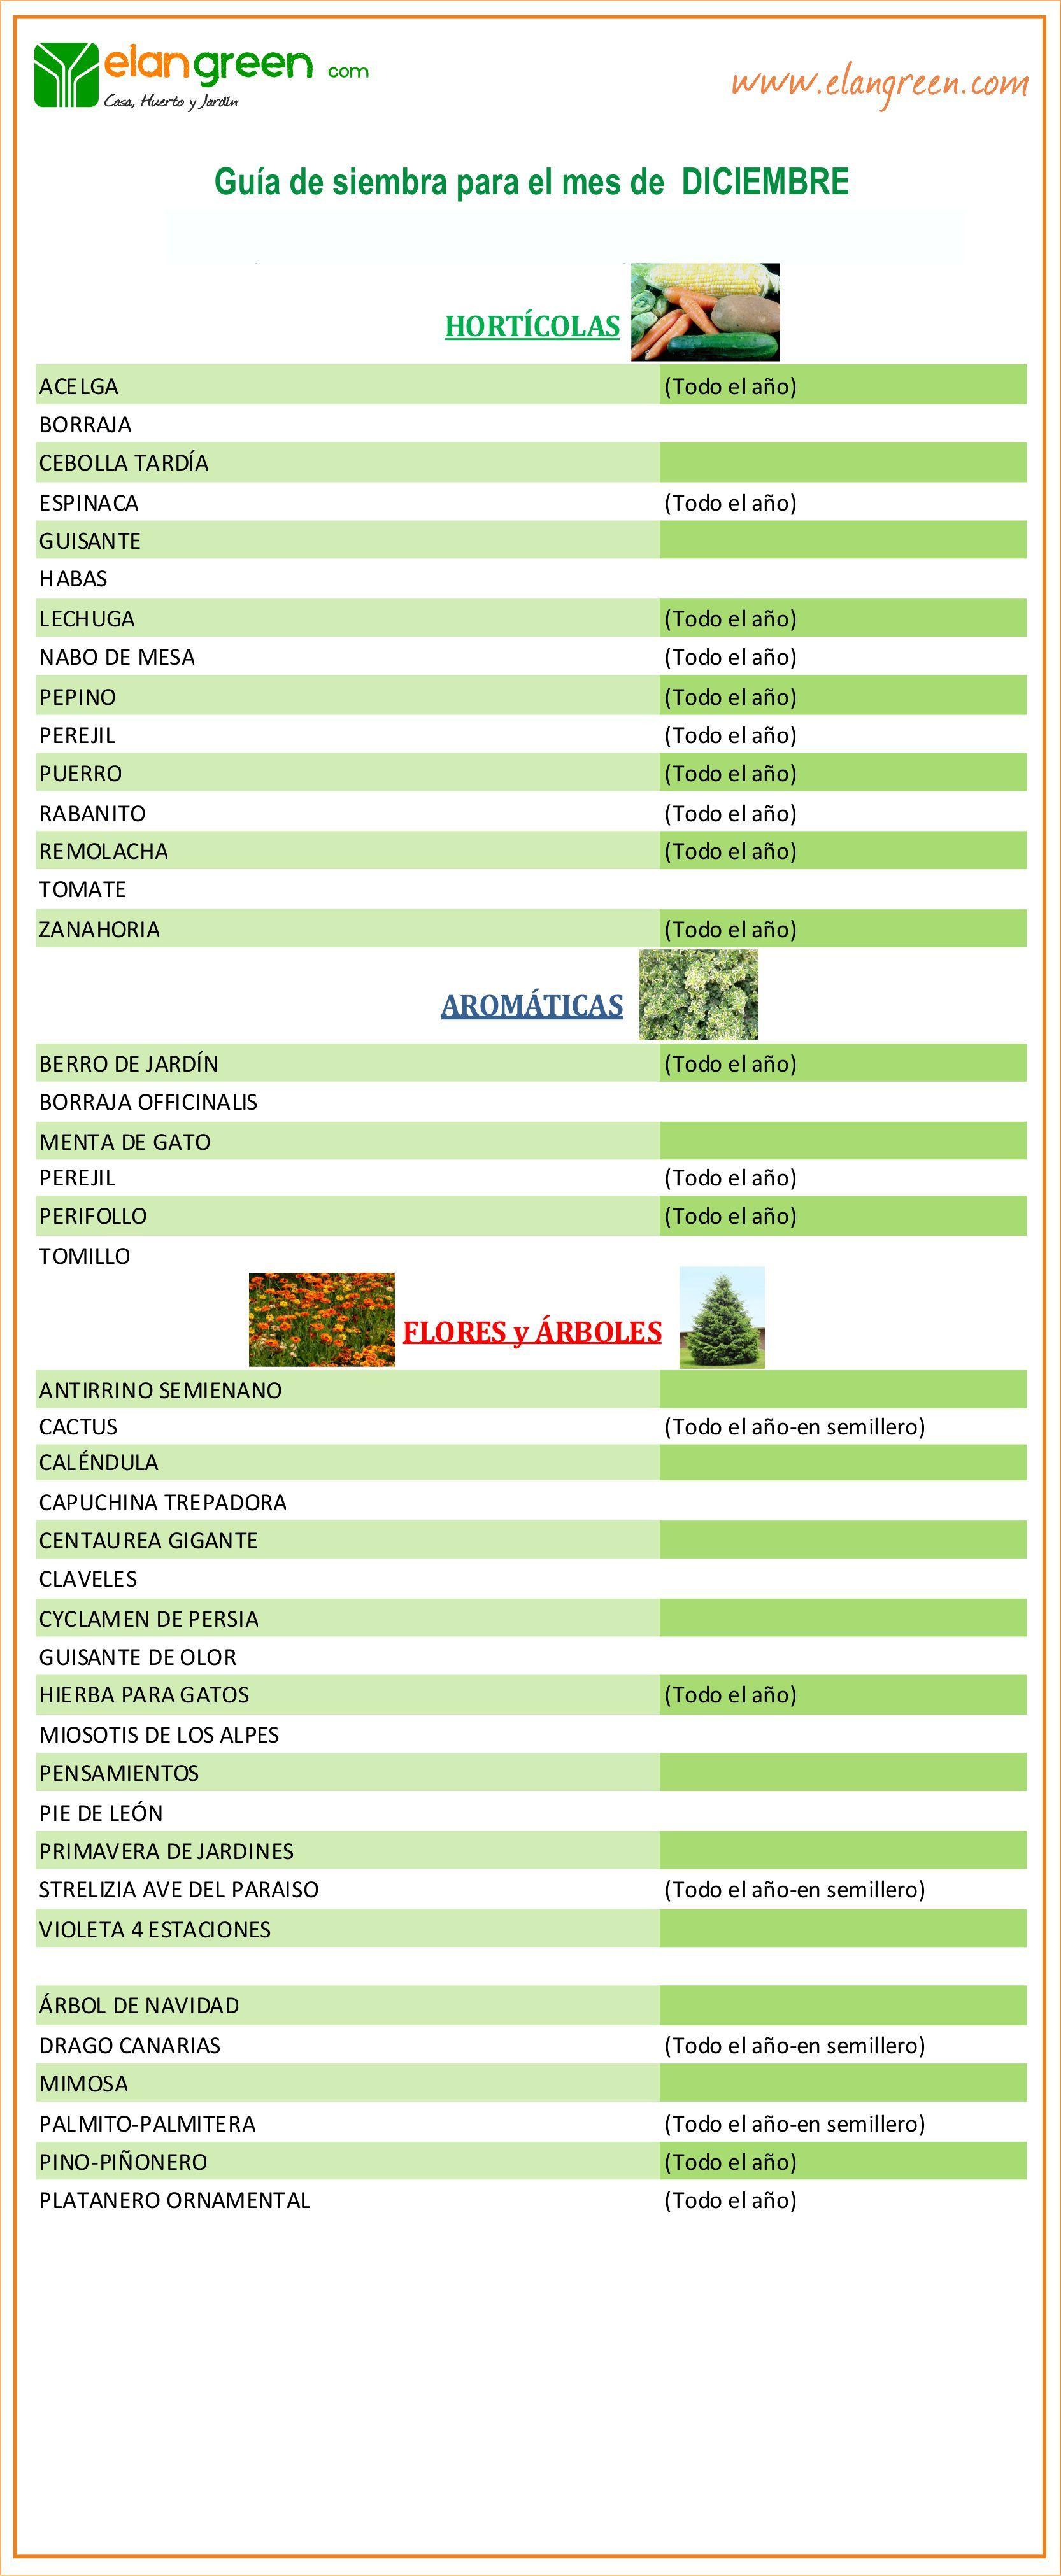 Guía De Siembra Mes De Diciembre Www Elangreen Com Siembras Hortícolas Borraja